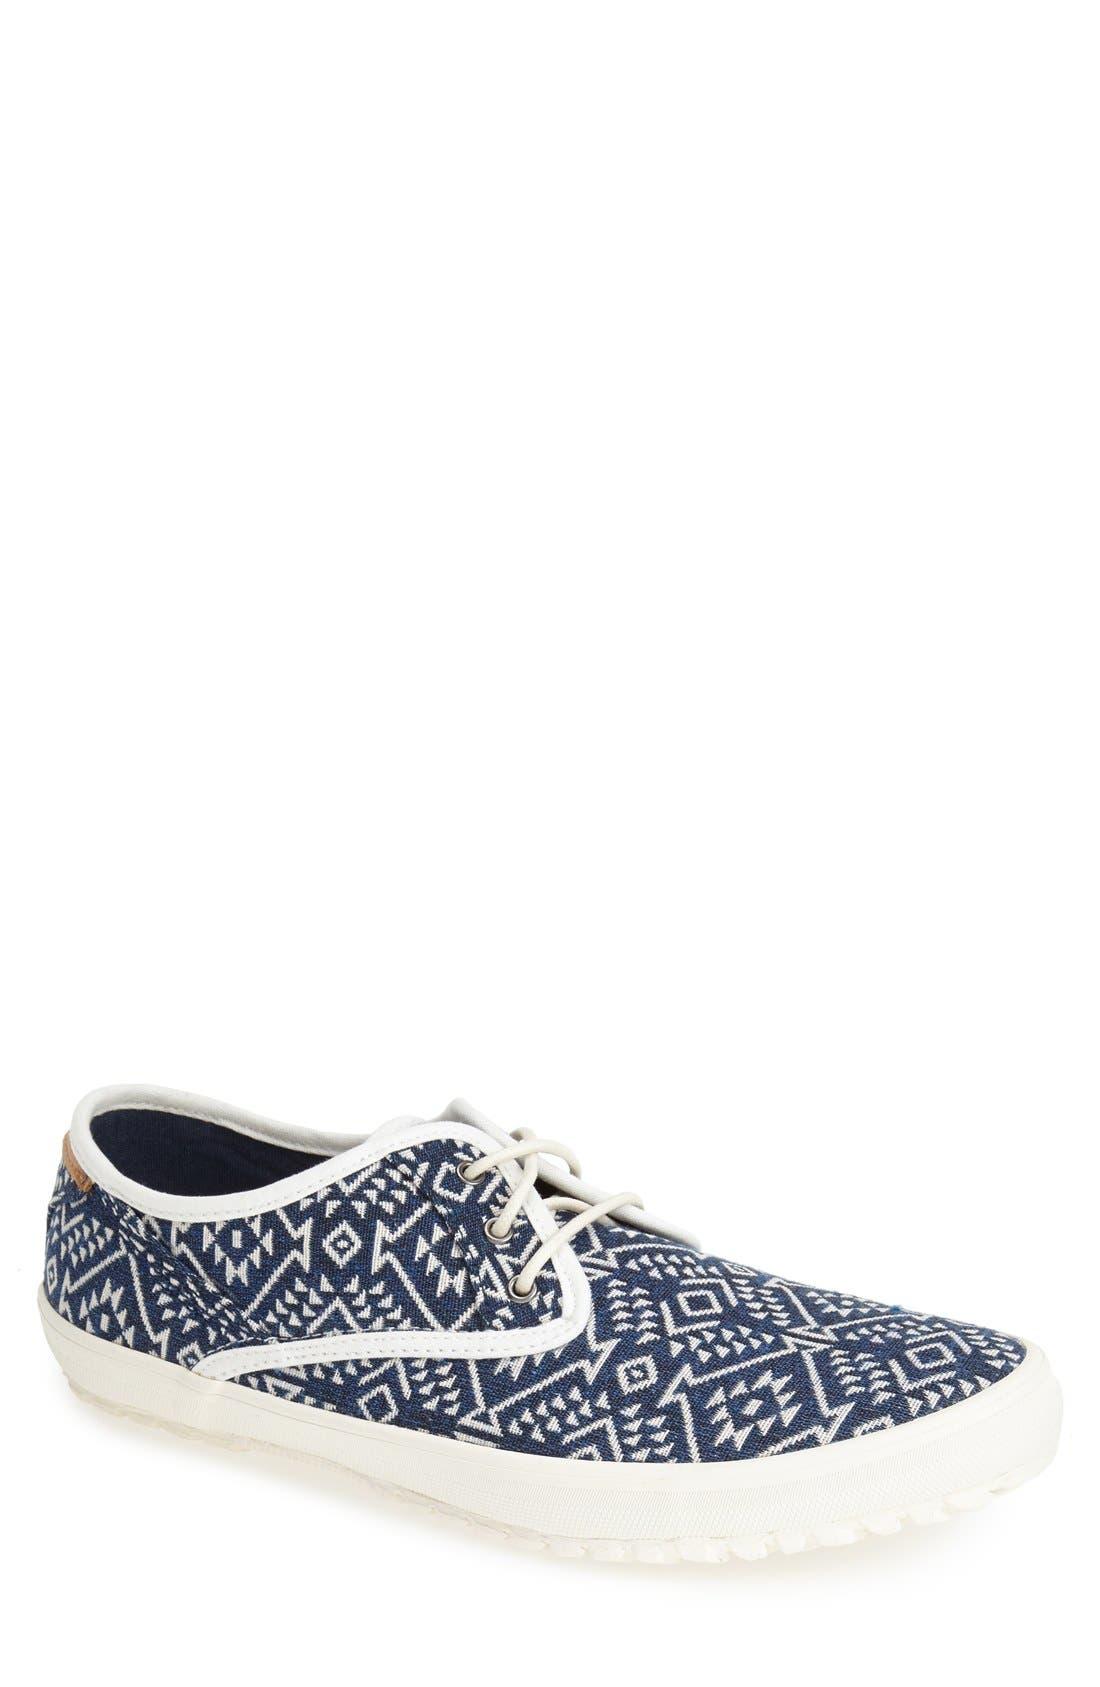 Alternate Image 1 Selected - J SHOES 'Civil' Sneaker